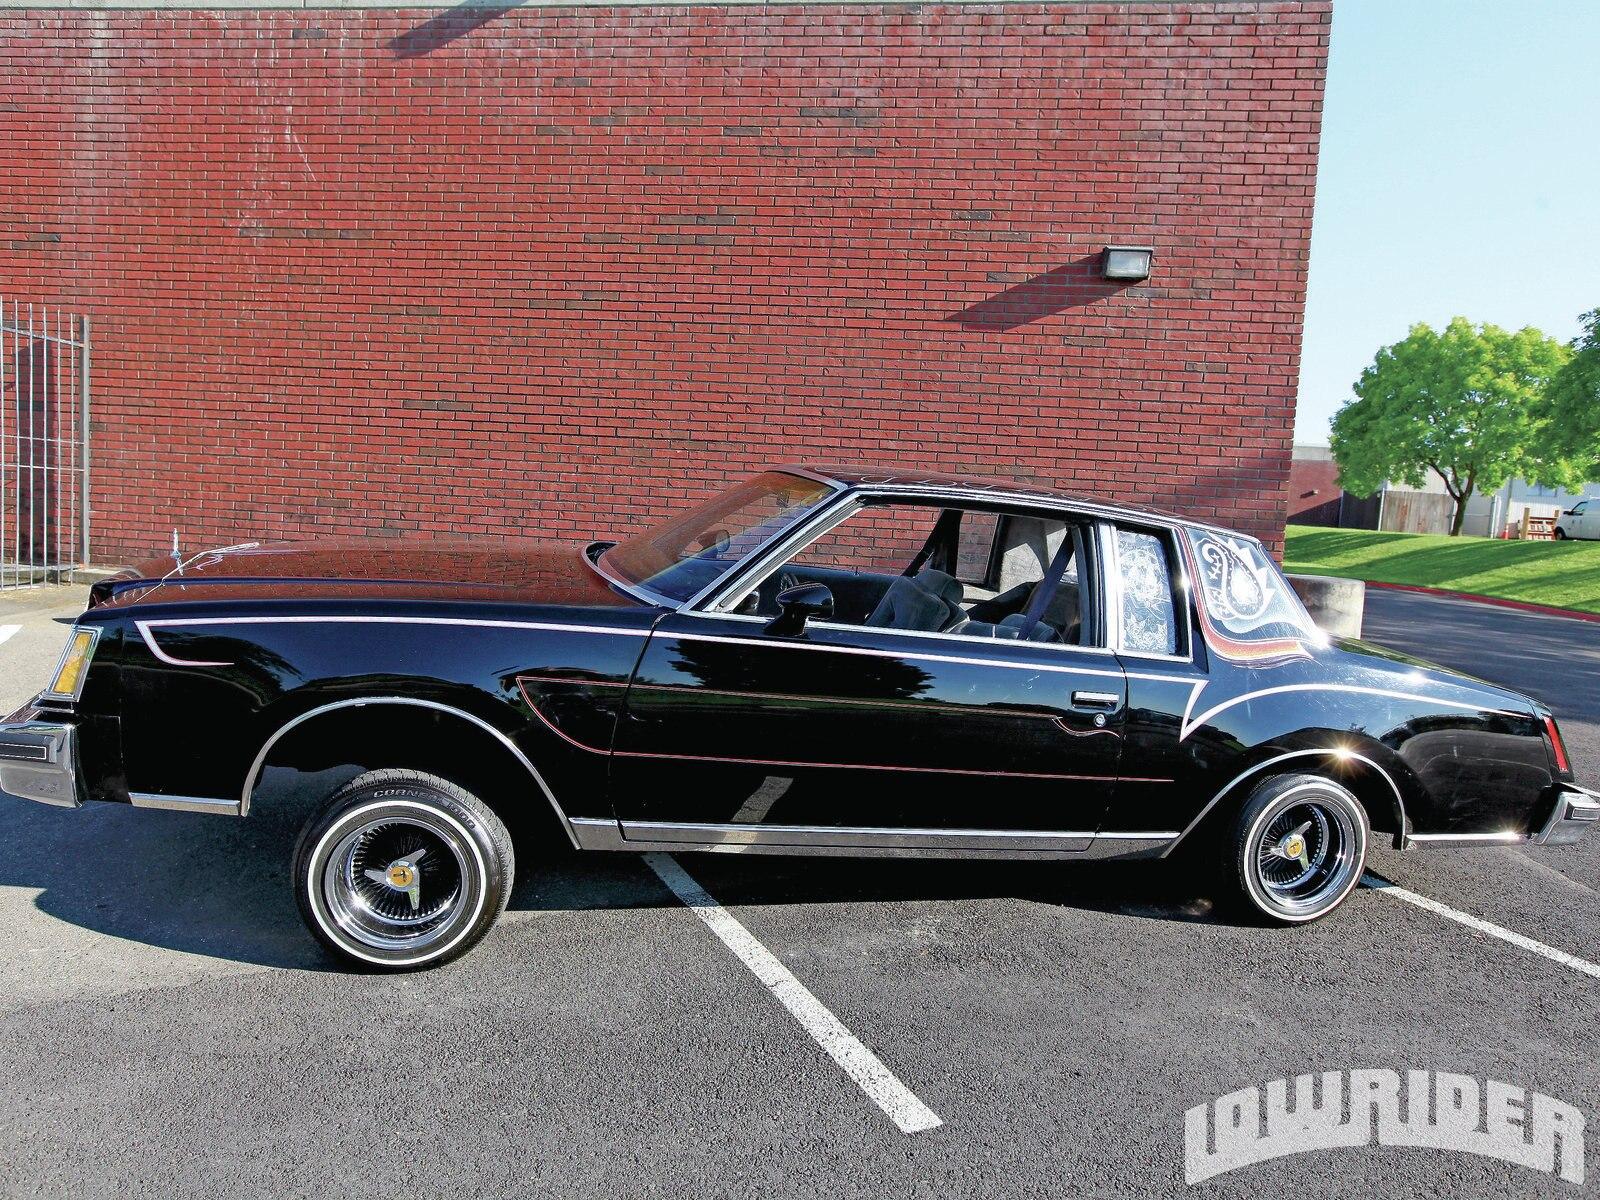 1110-lrmp-09-o-lowrider-on-the-blvd-1979-buick-regal2